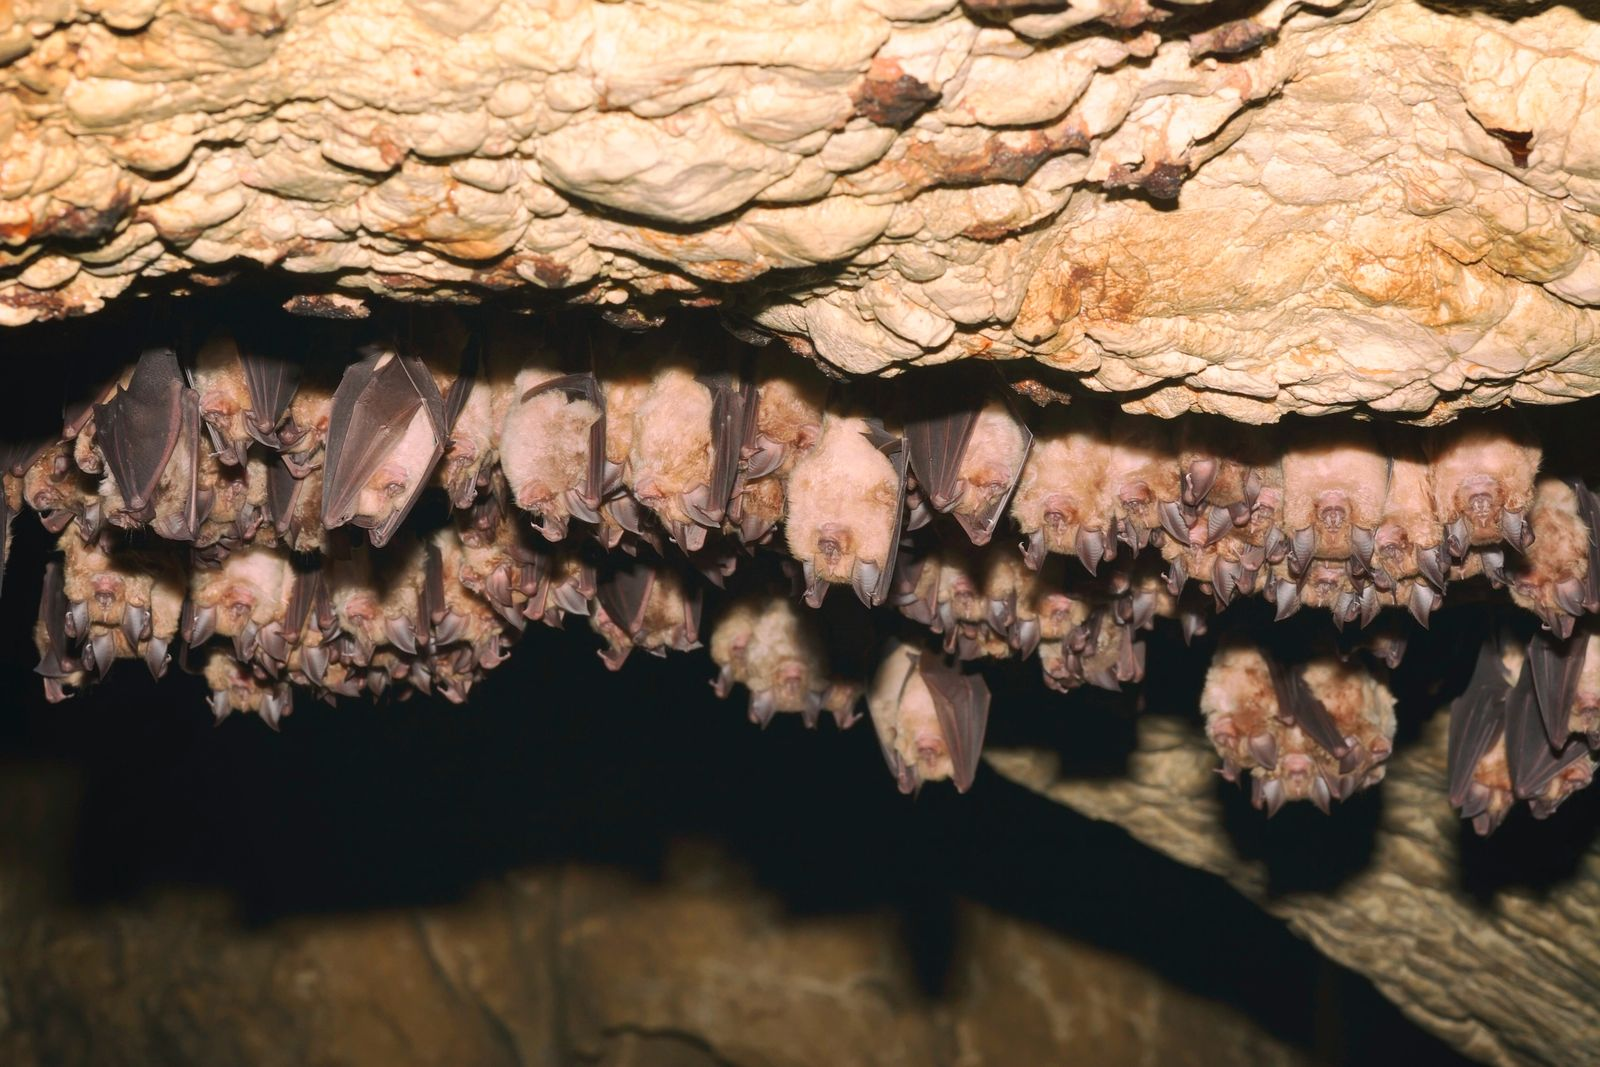 Groups of sleeping bats in cave - Lesser mouse-eared bat (Myotis blythii) and (Rhinolophus hipposideros) - Lesser Horseshoe Bat (remus20)